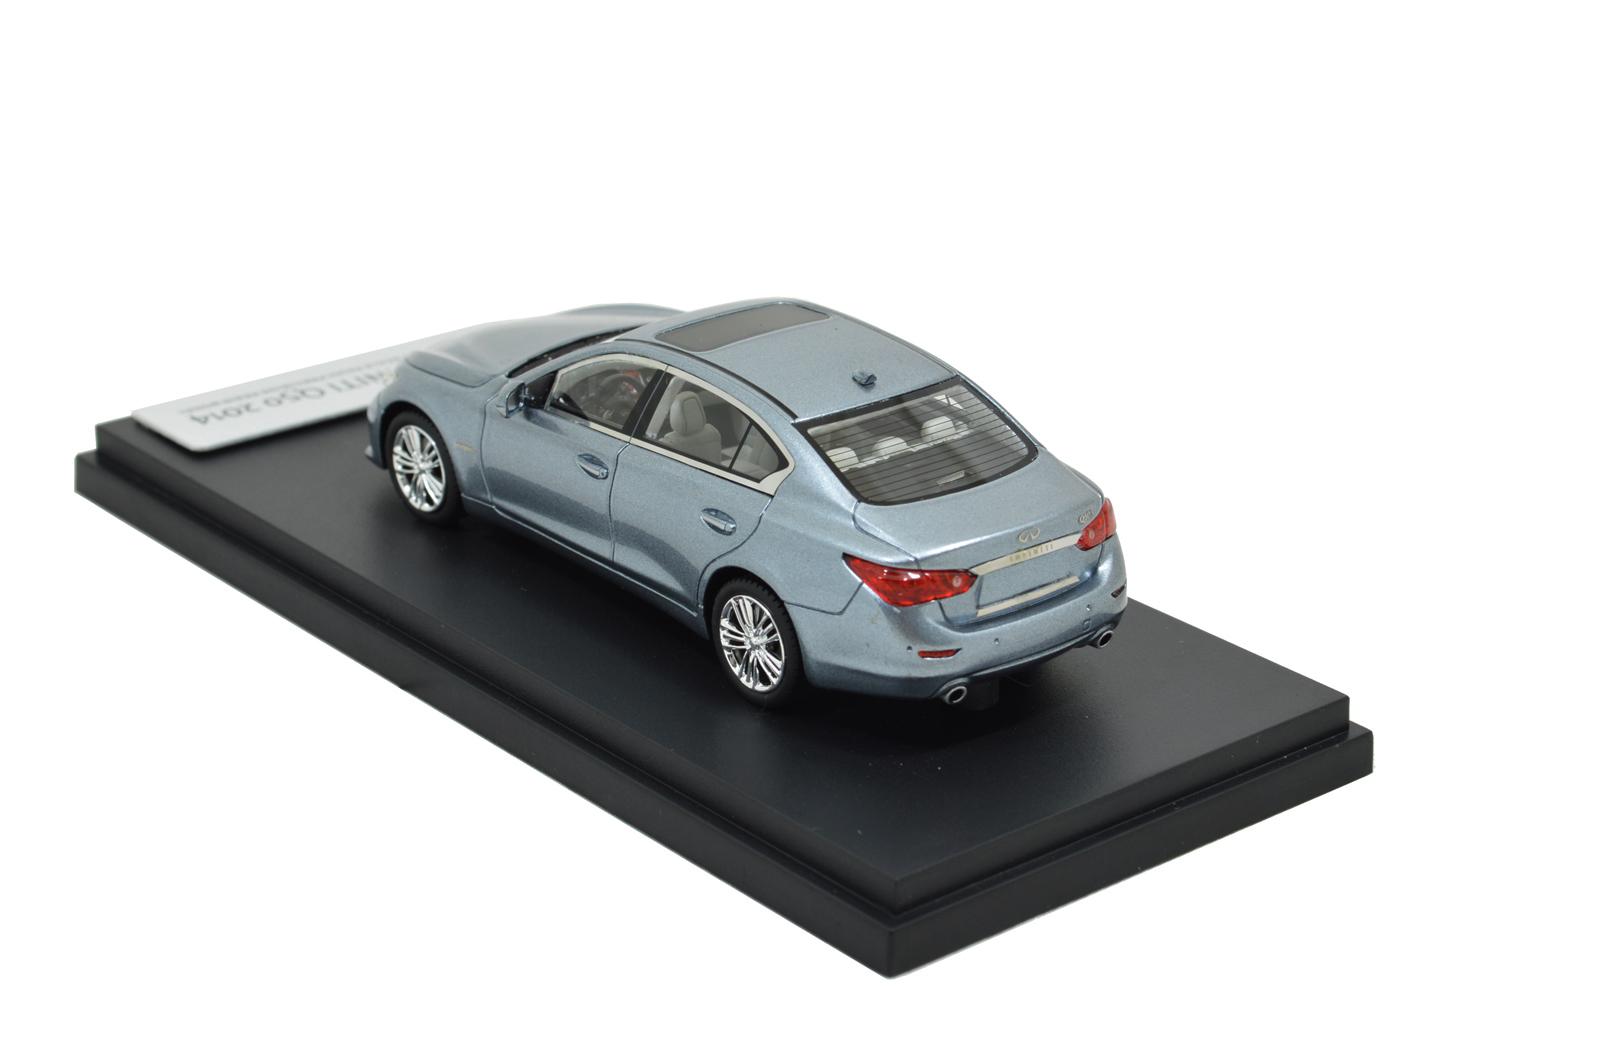 Infiniti Q50 2014 Resin 1/43 Scale Model Car(limit 150PCS) 11